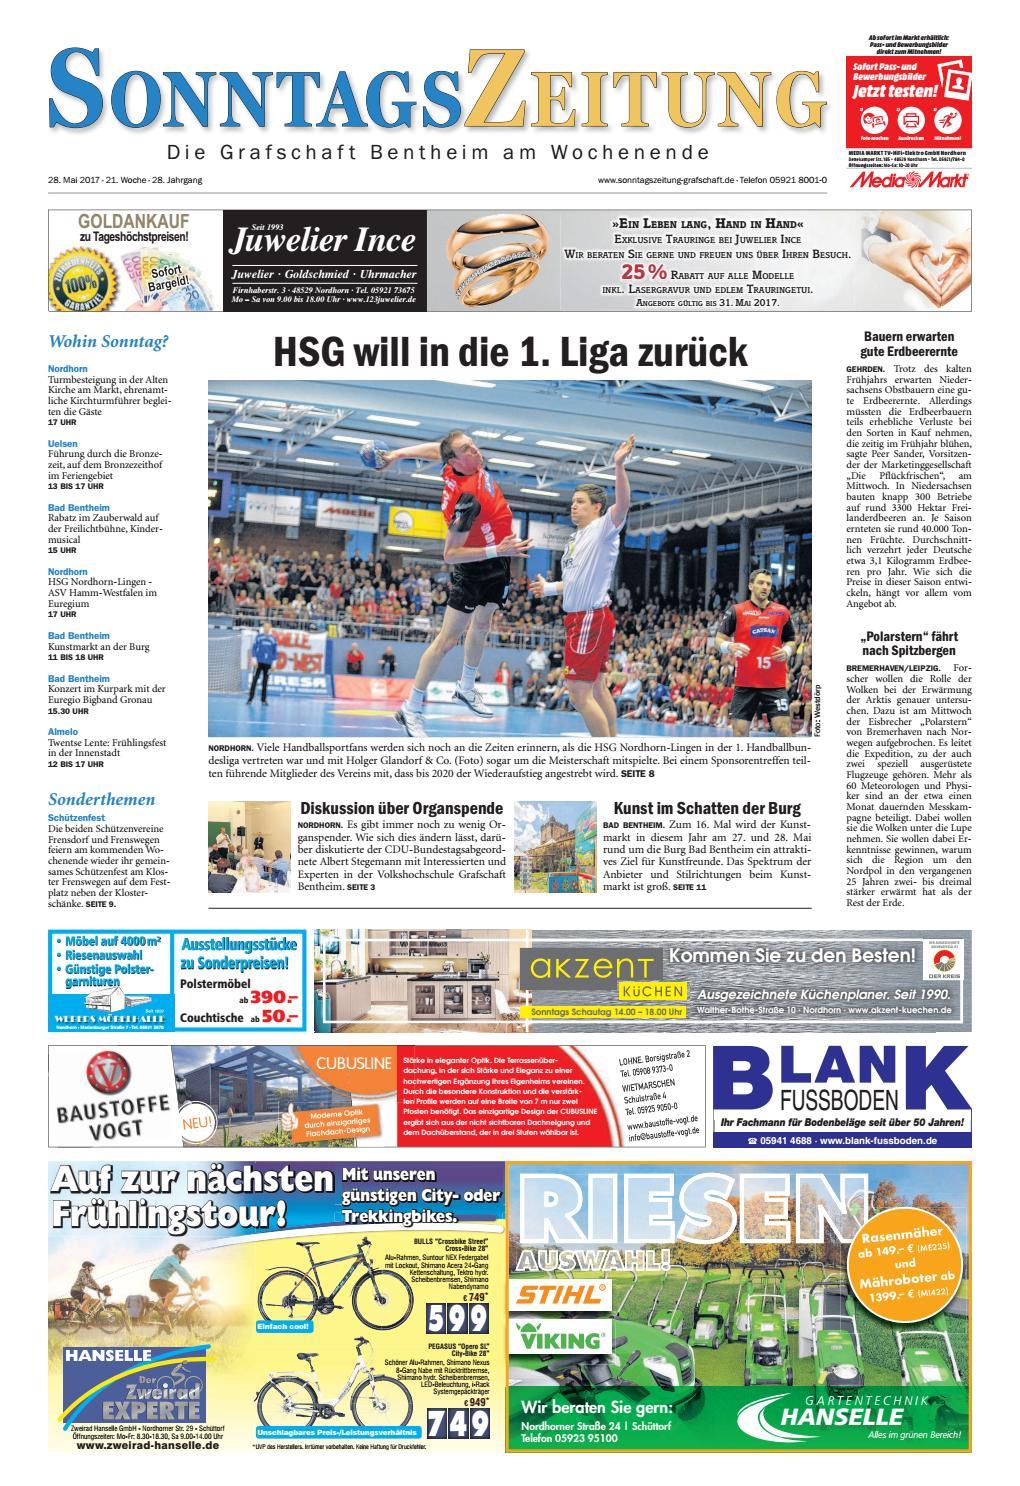 sonntagszeitung 28 05 2017 by sonntagszeitung issuu. Black Bedroom Furniture Sets. Home Design Ideas